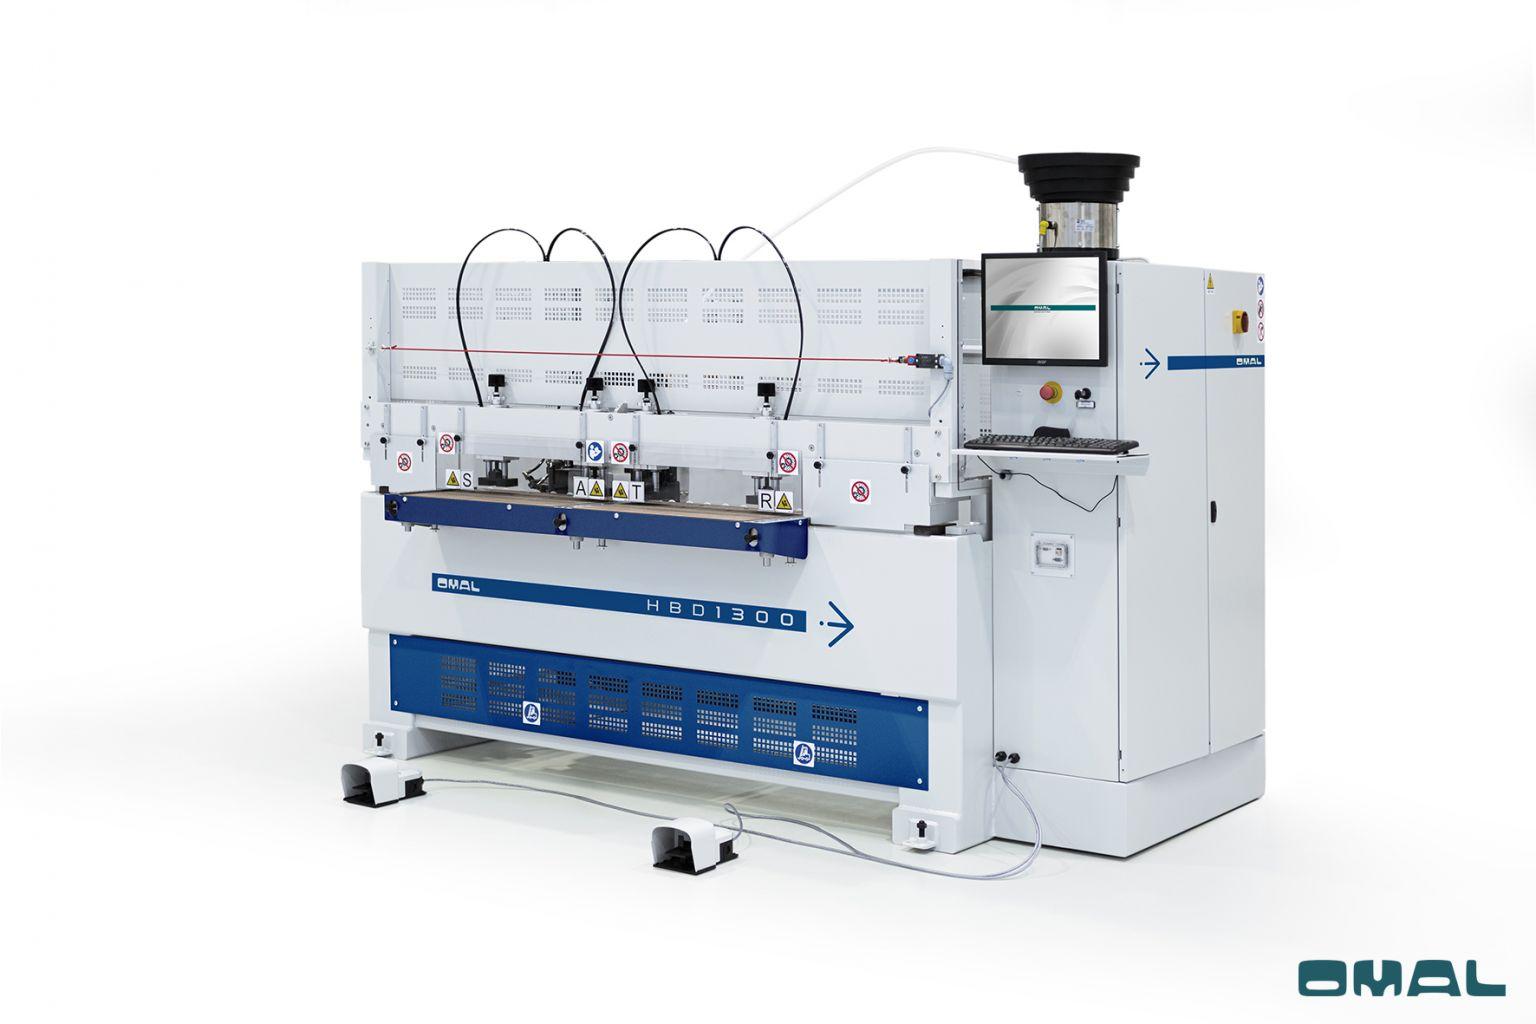 HBD 1300 / 2500